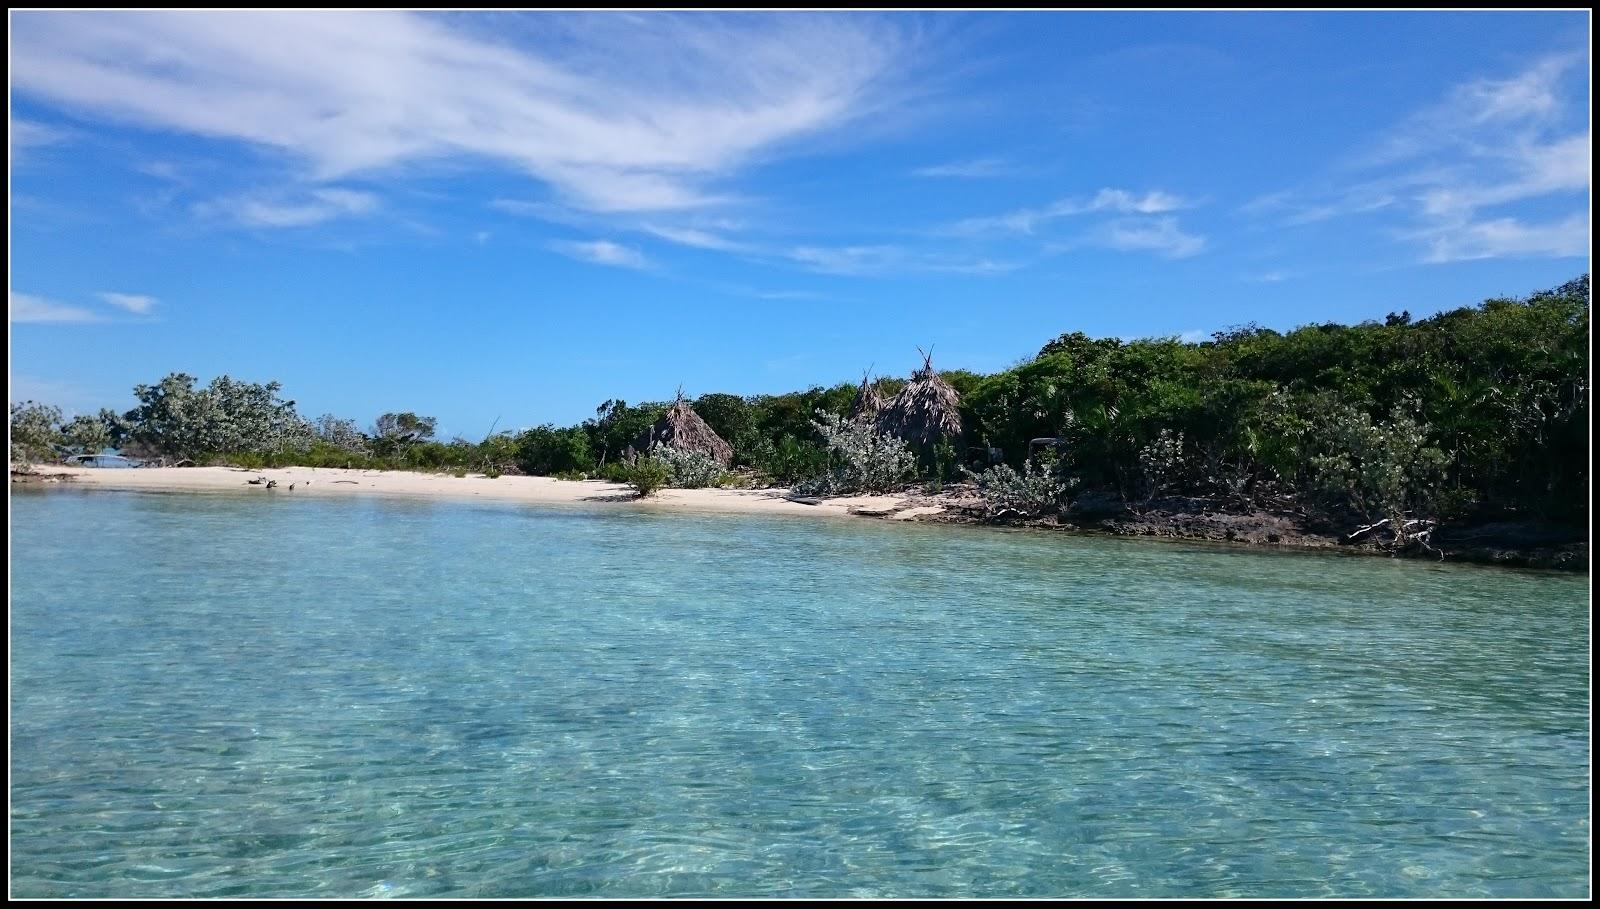 Bahamas-deserted-island.jpg